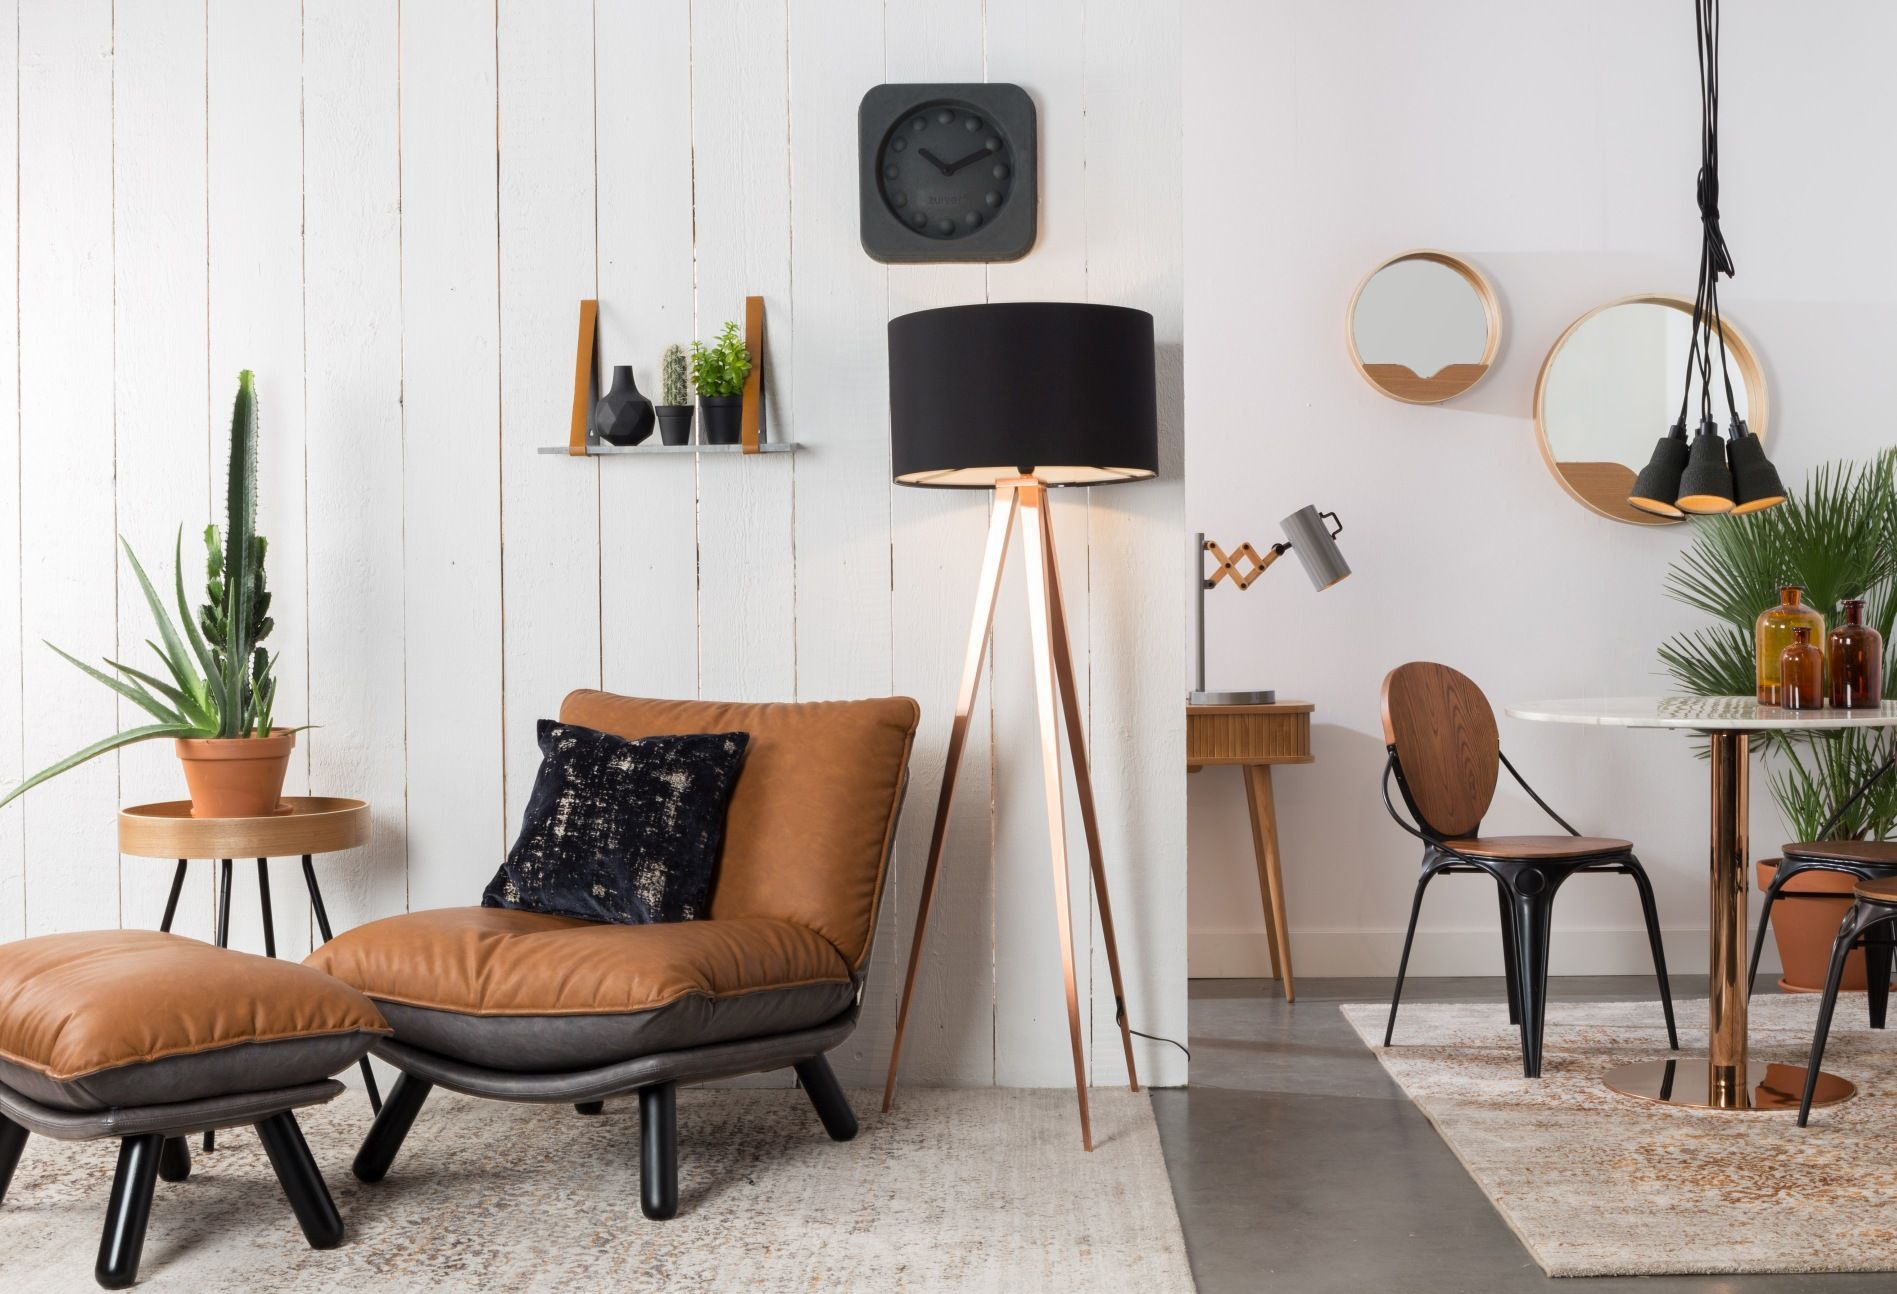 Zuiver fauteuil lounge chair lazy sack bruin grijs lofts